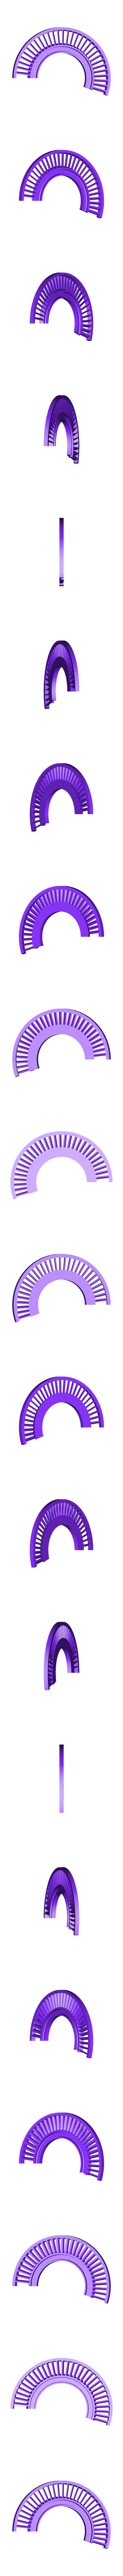 Turbine-LP-NGV01.stl Download free STL file Turboprop Engine • 3D printable model, konchan77